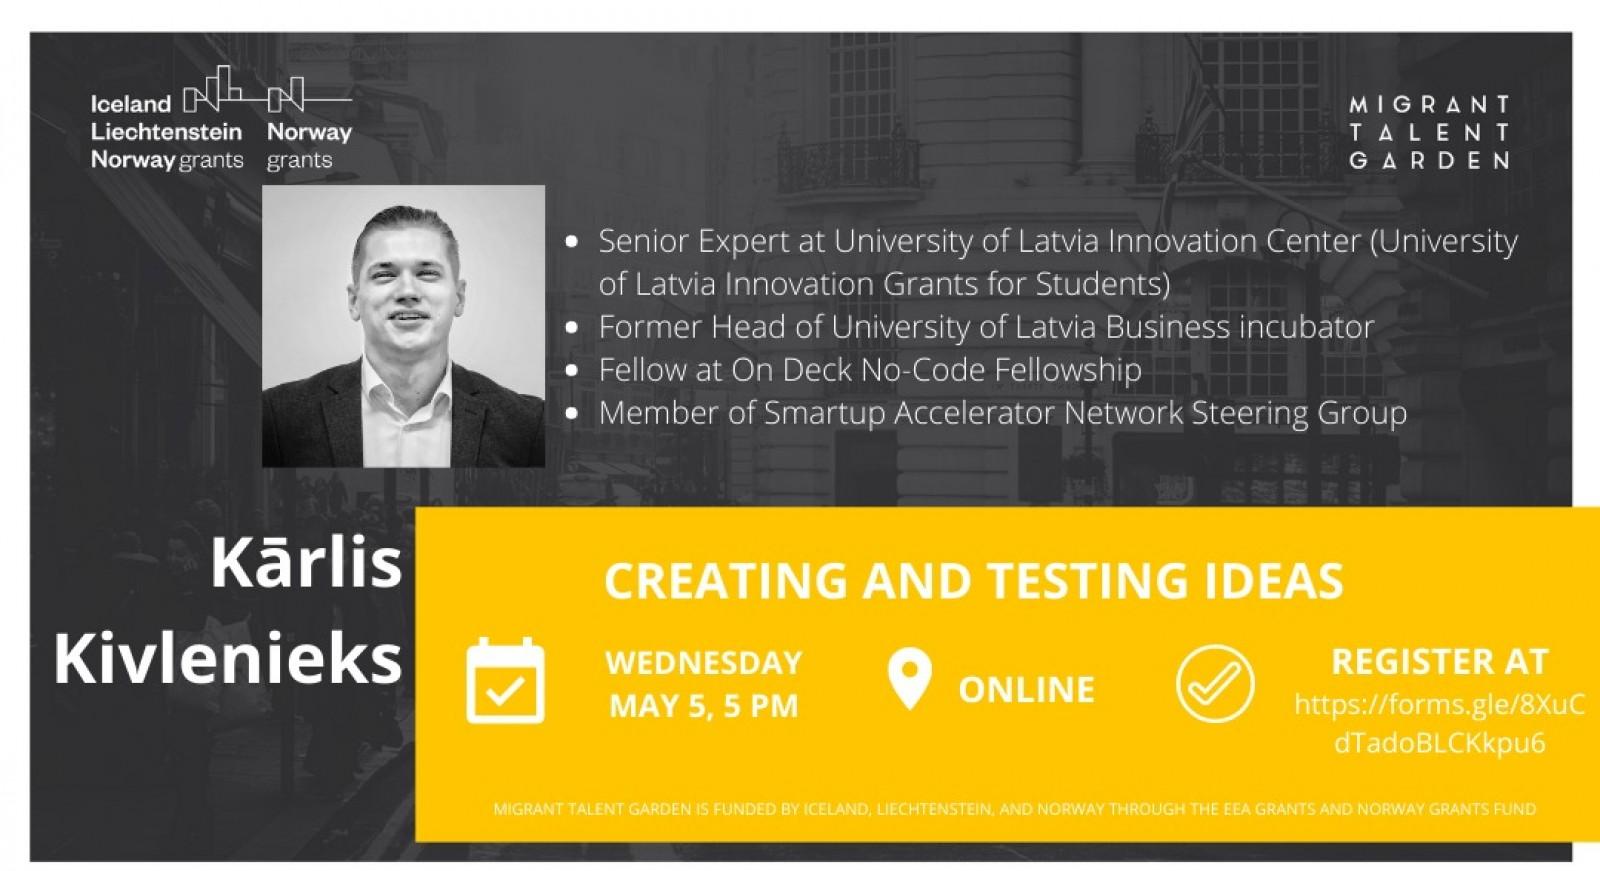 Next Migrant Talent Garden lecture on creating business ideas to be led by the senior expert of the University of Latvia Innovation Center Kārlis Kivlenieks | Patvērums Drošā Māja